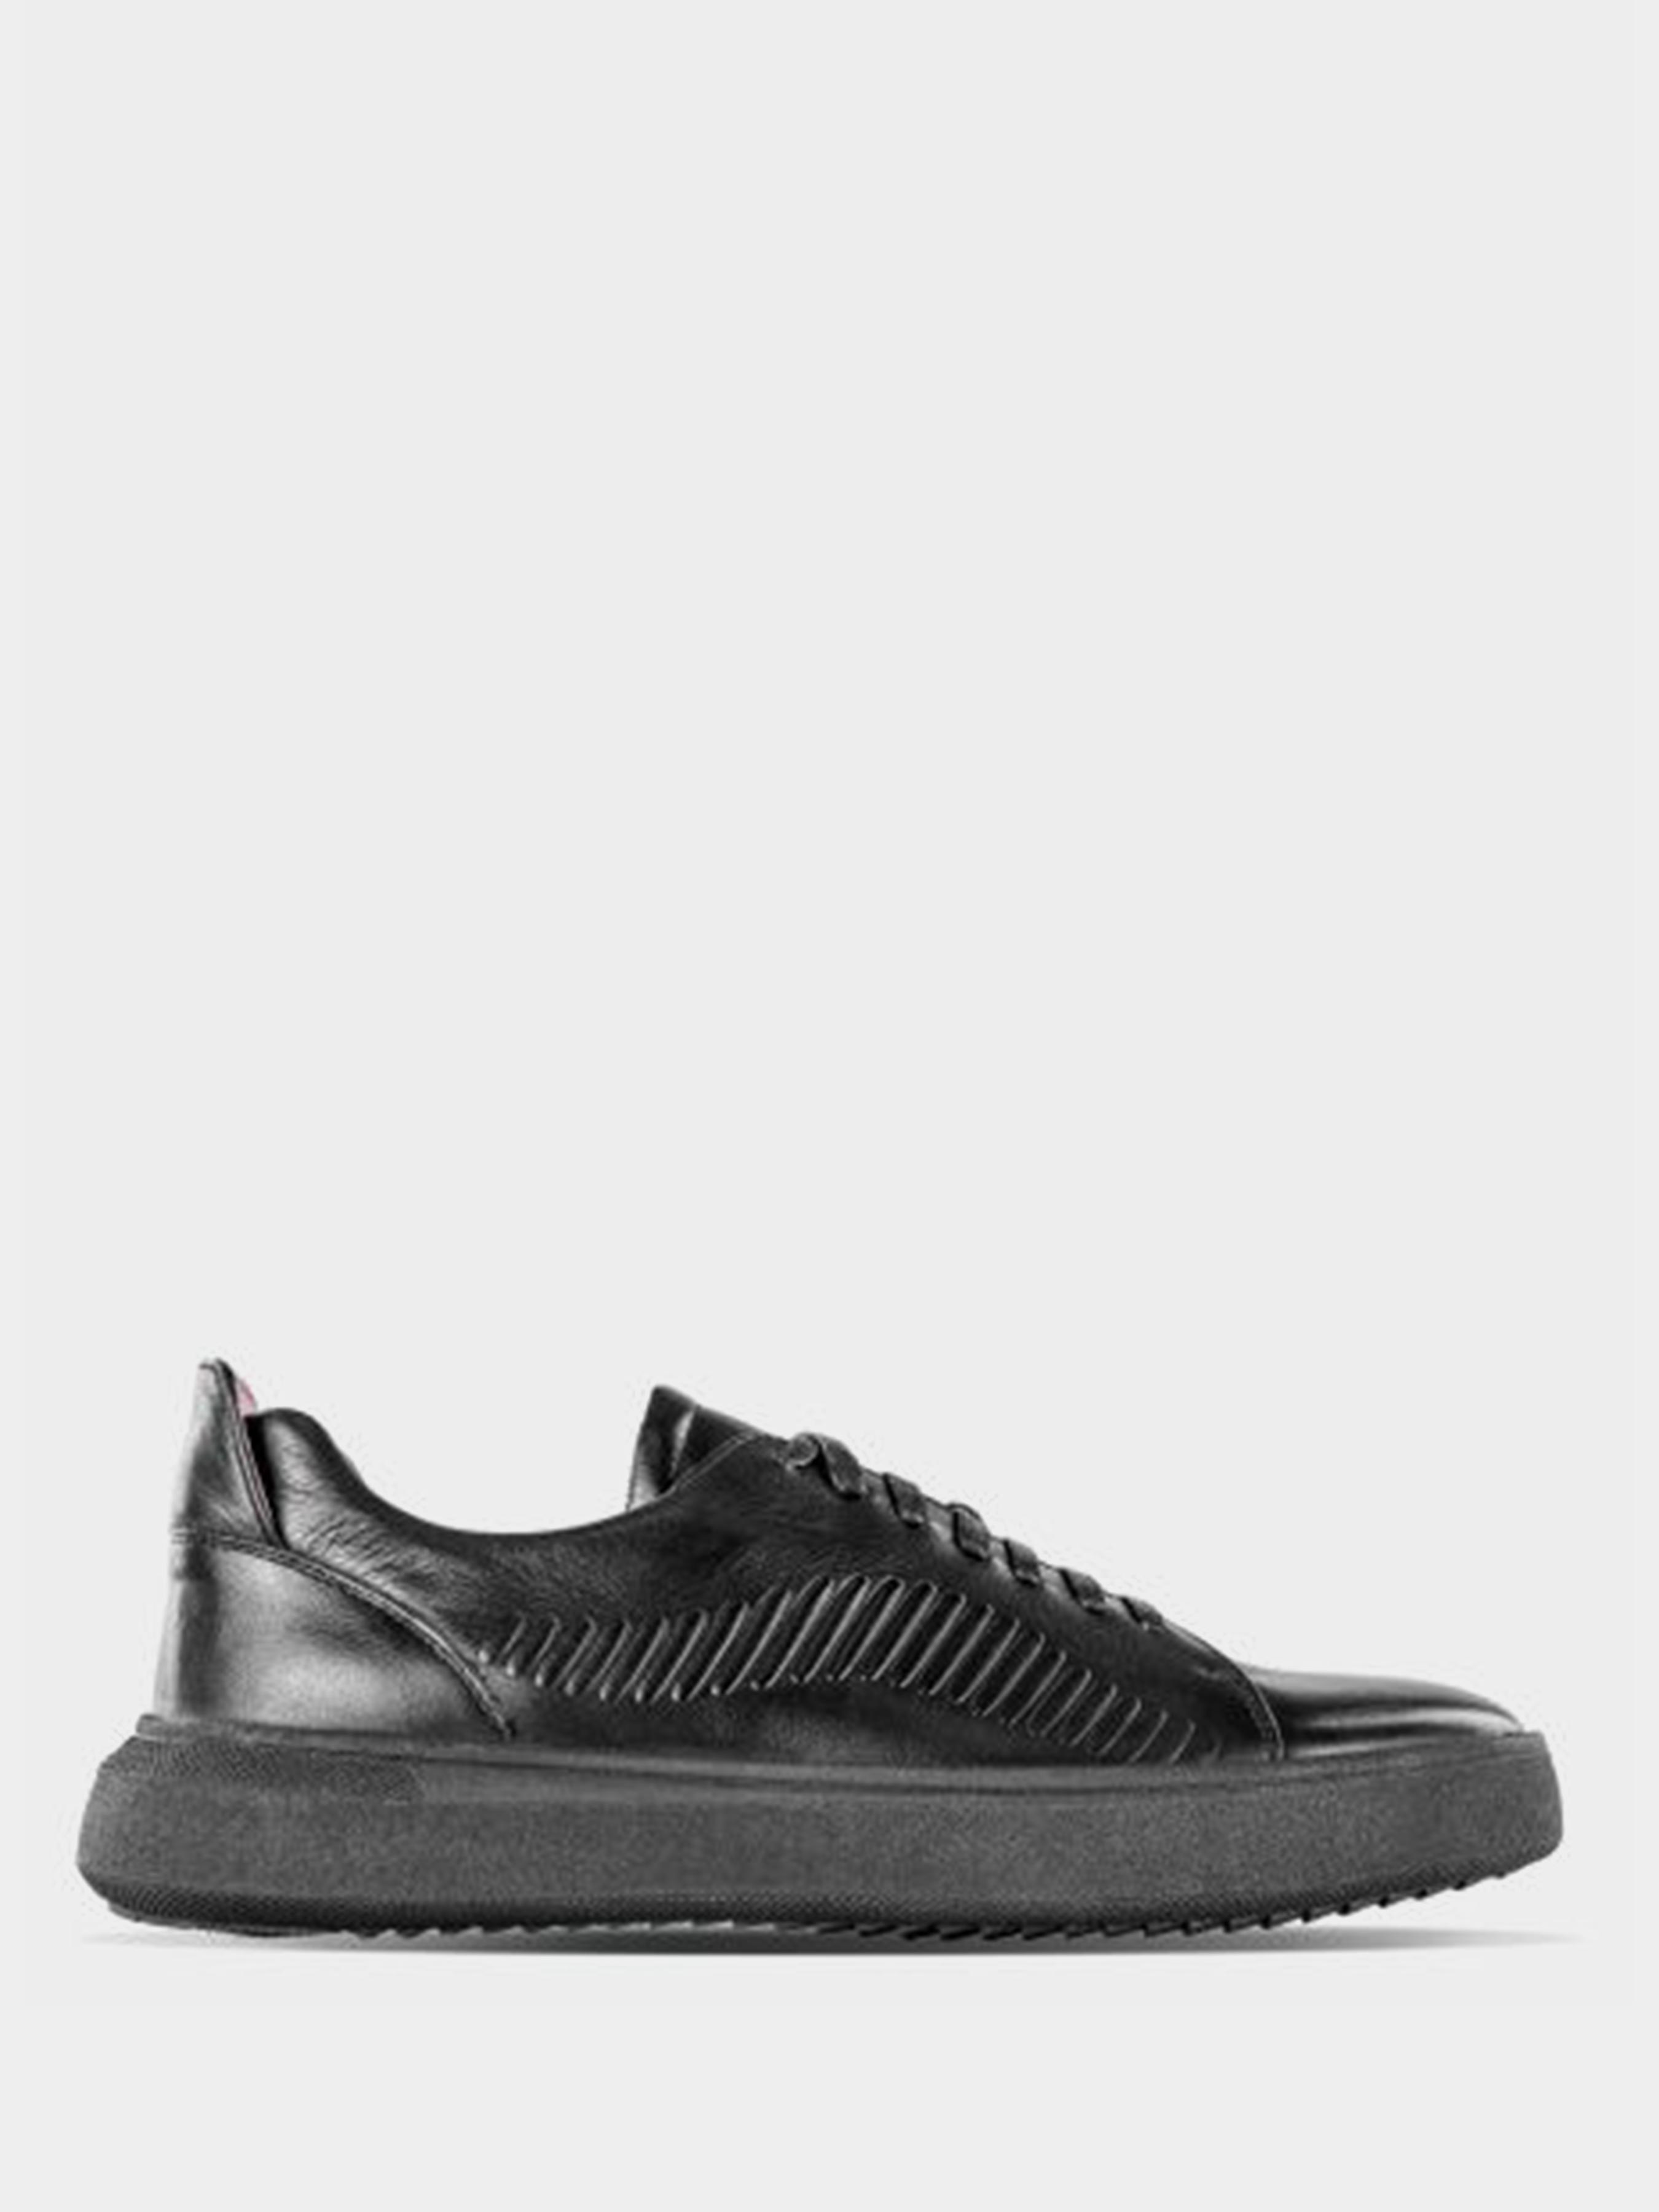 Кеды для мужчин Braska 124-4203/101 размеры обуви, 2017